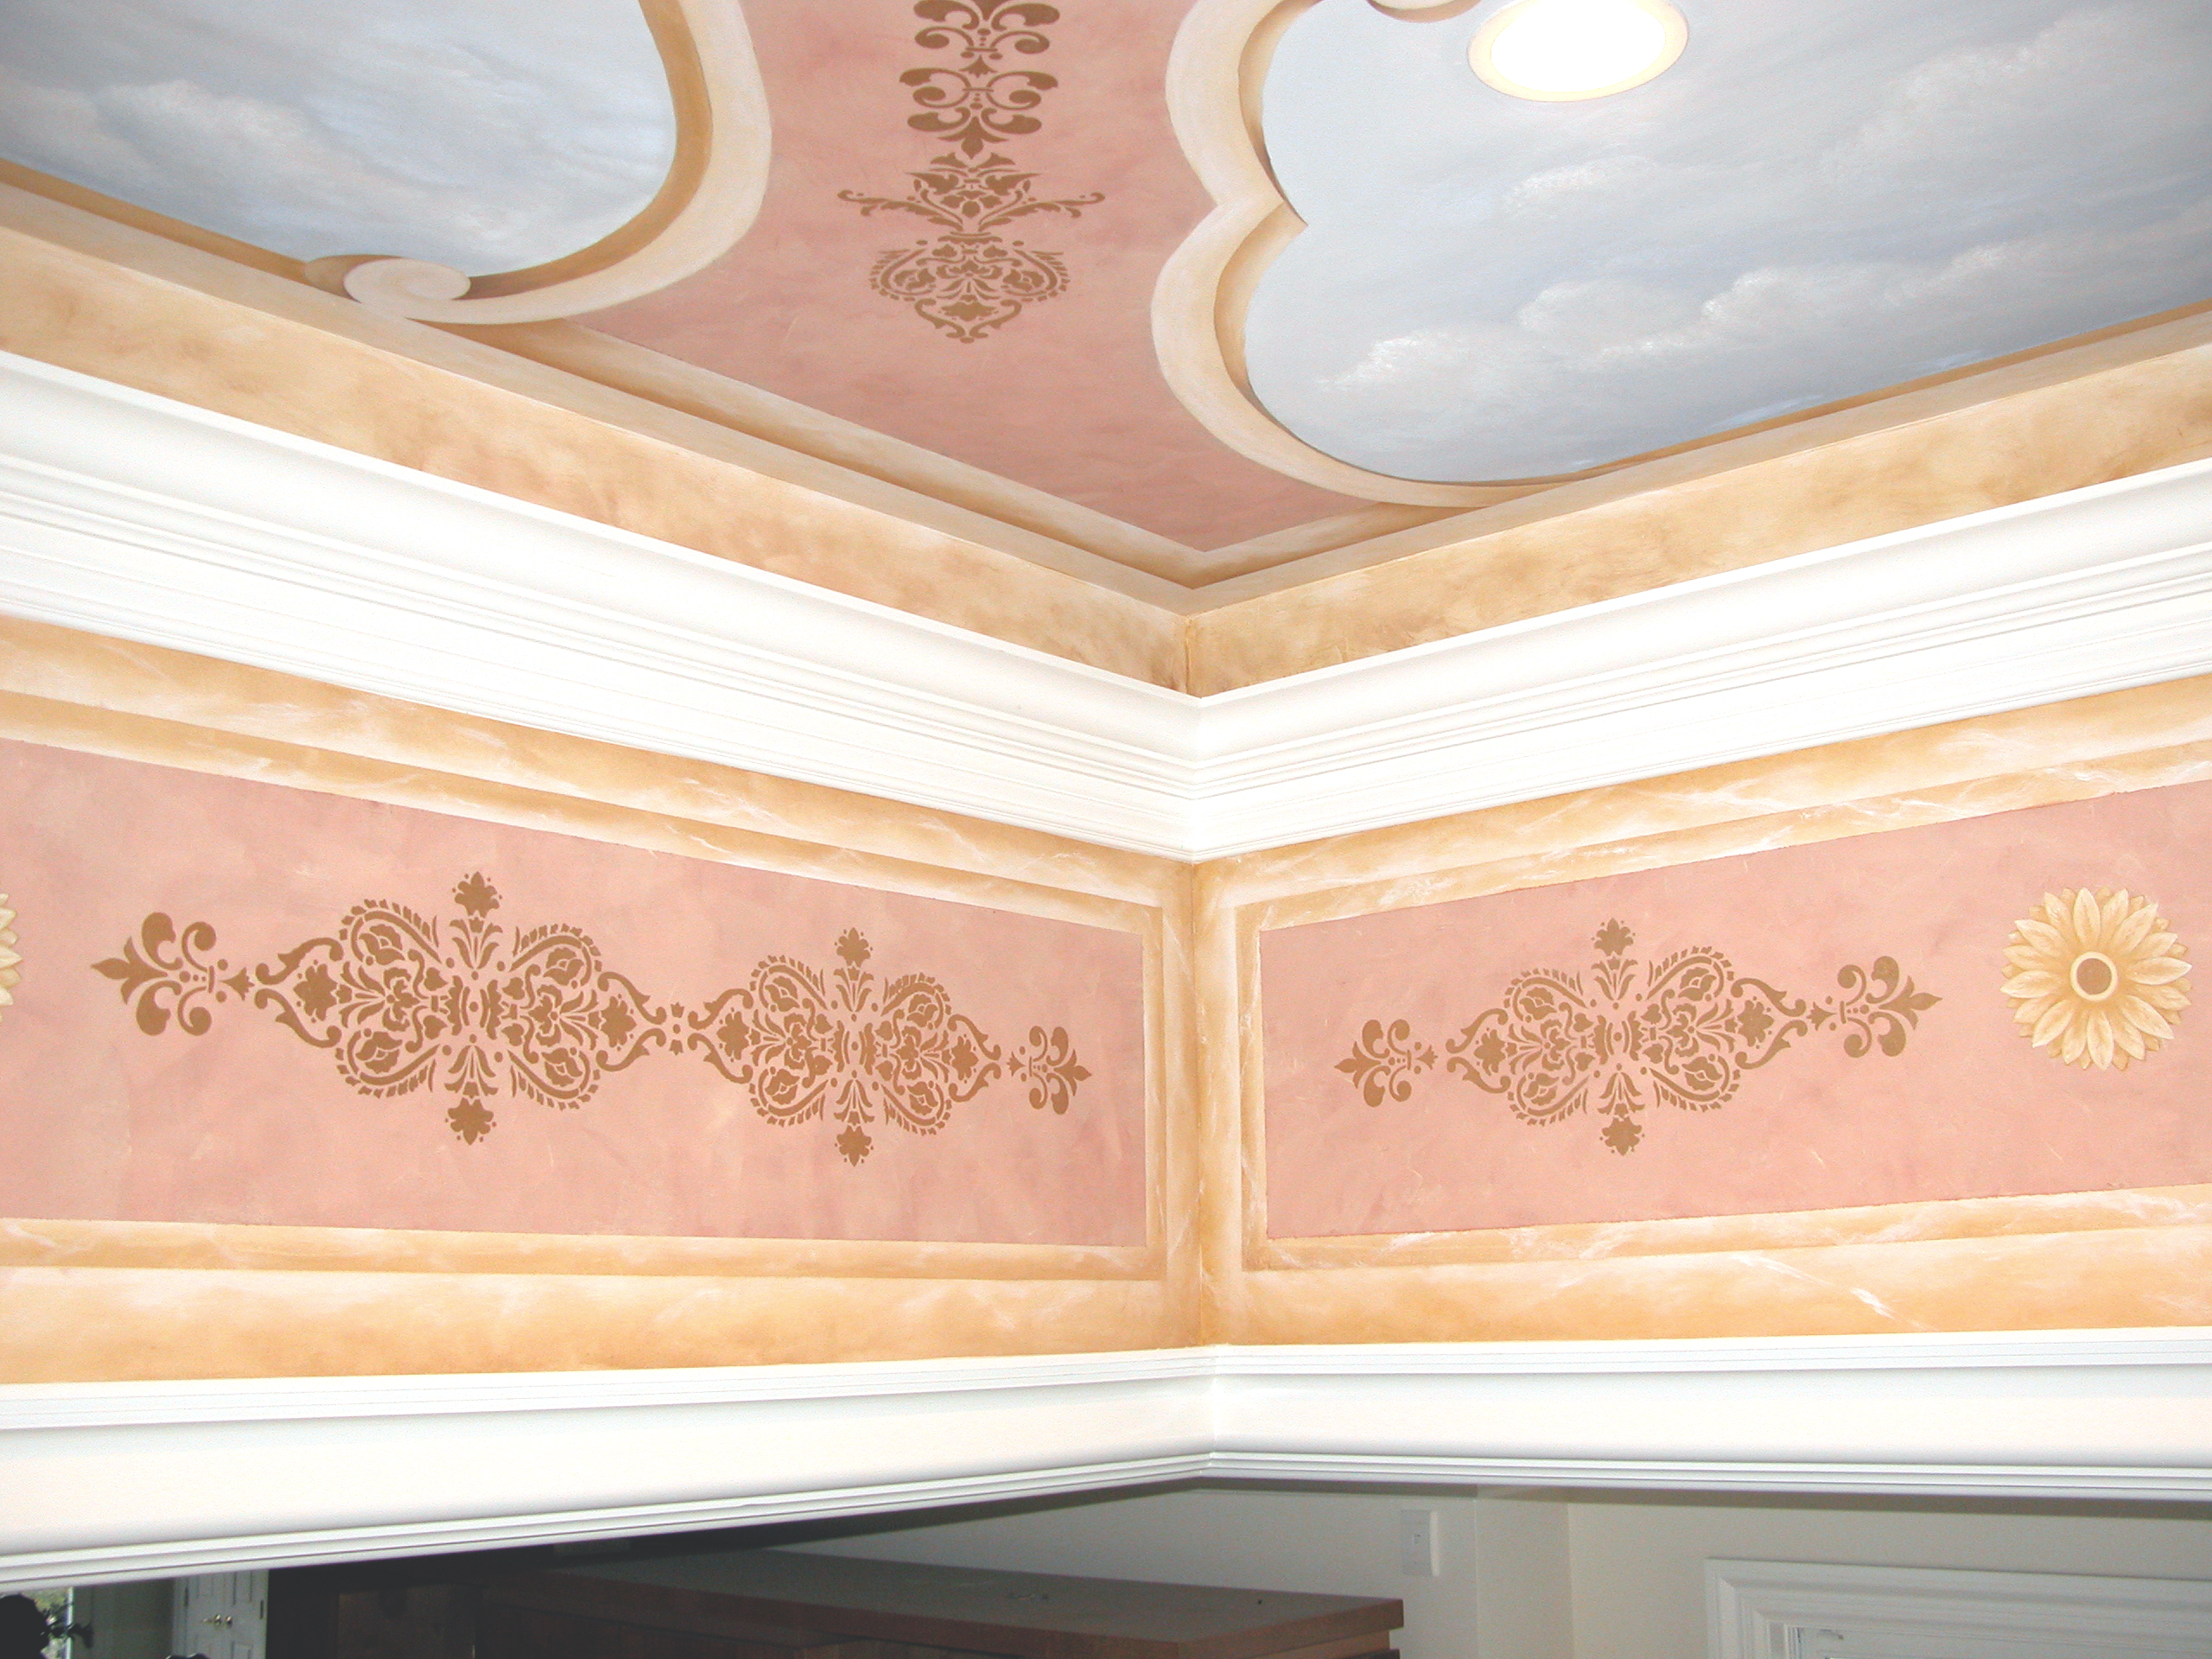 Mural Ceiling Design North caldwell